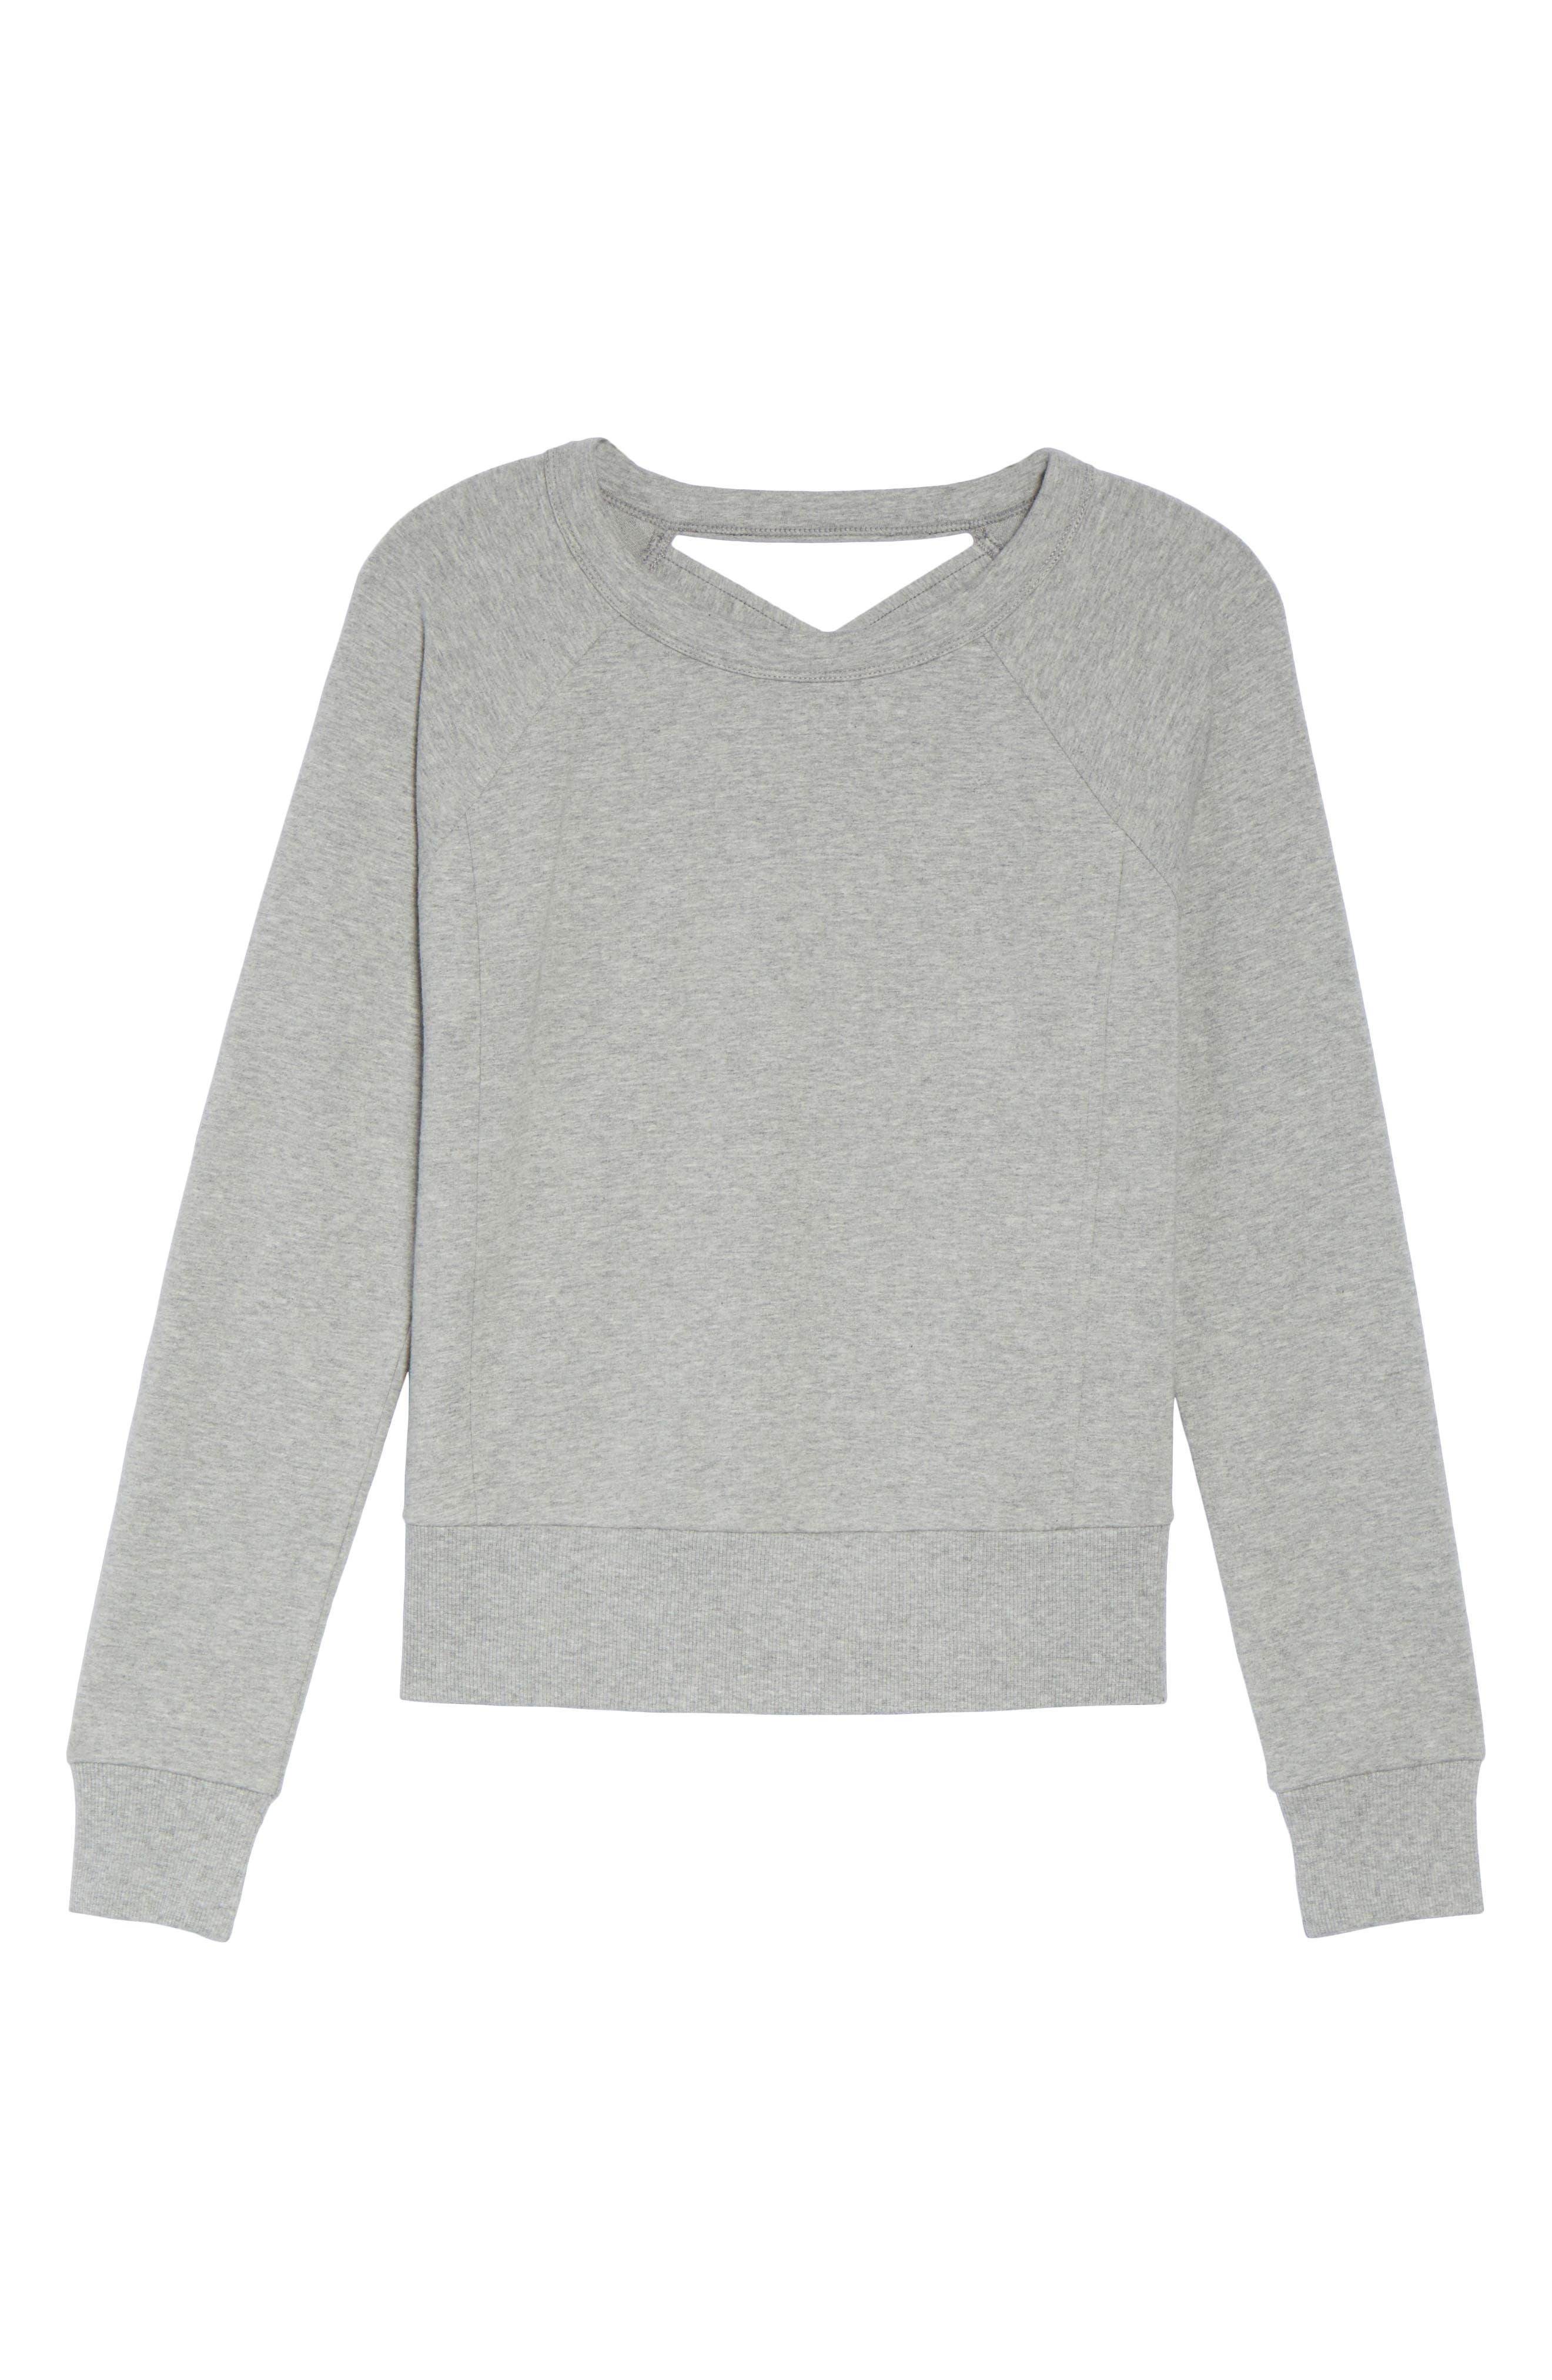 Covet Crisscross Sweatshirt,                             Alternate thumbnail 13, color,